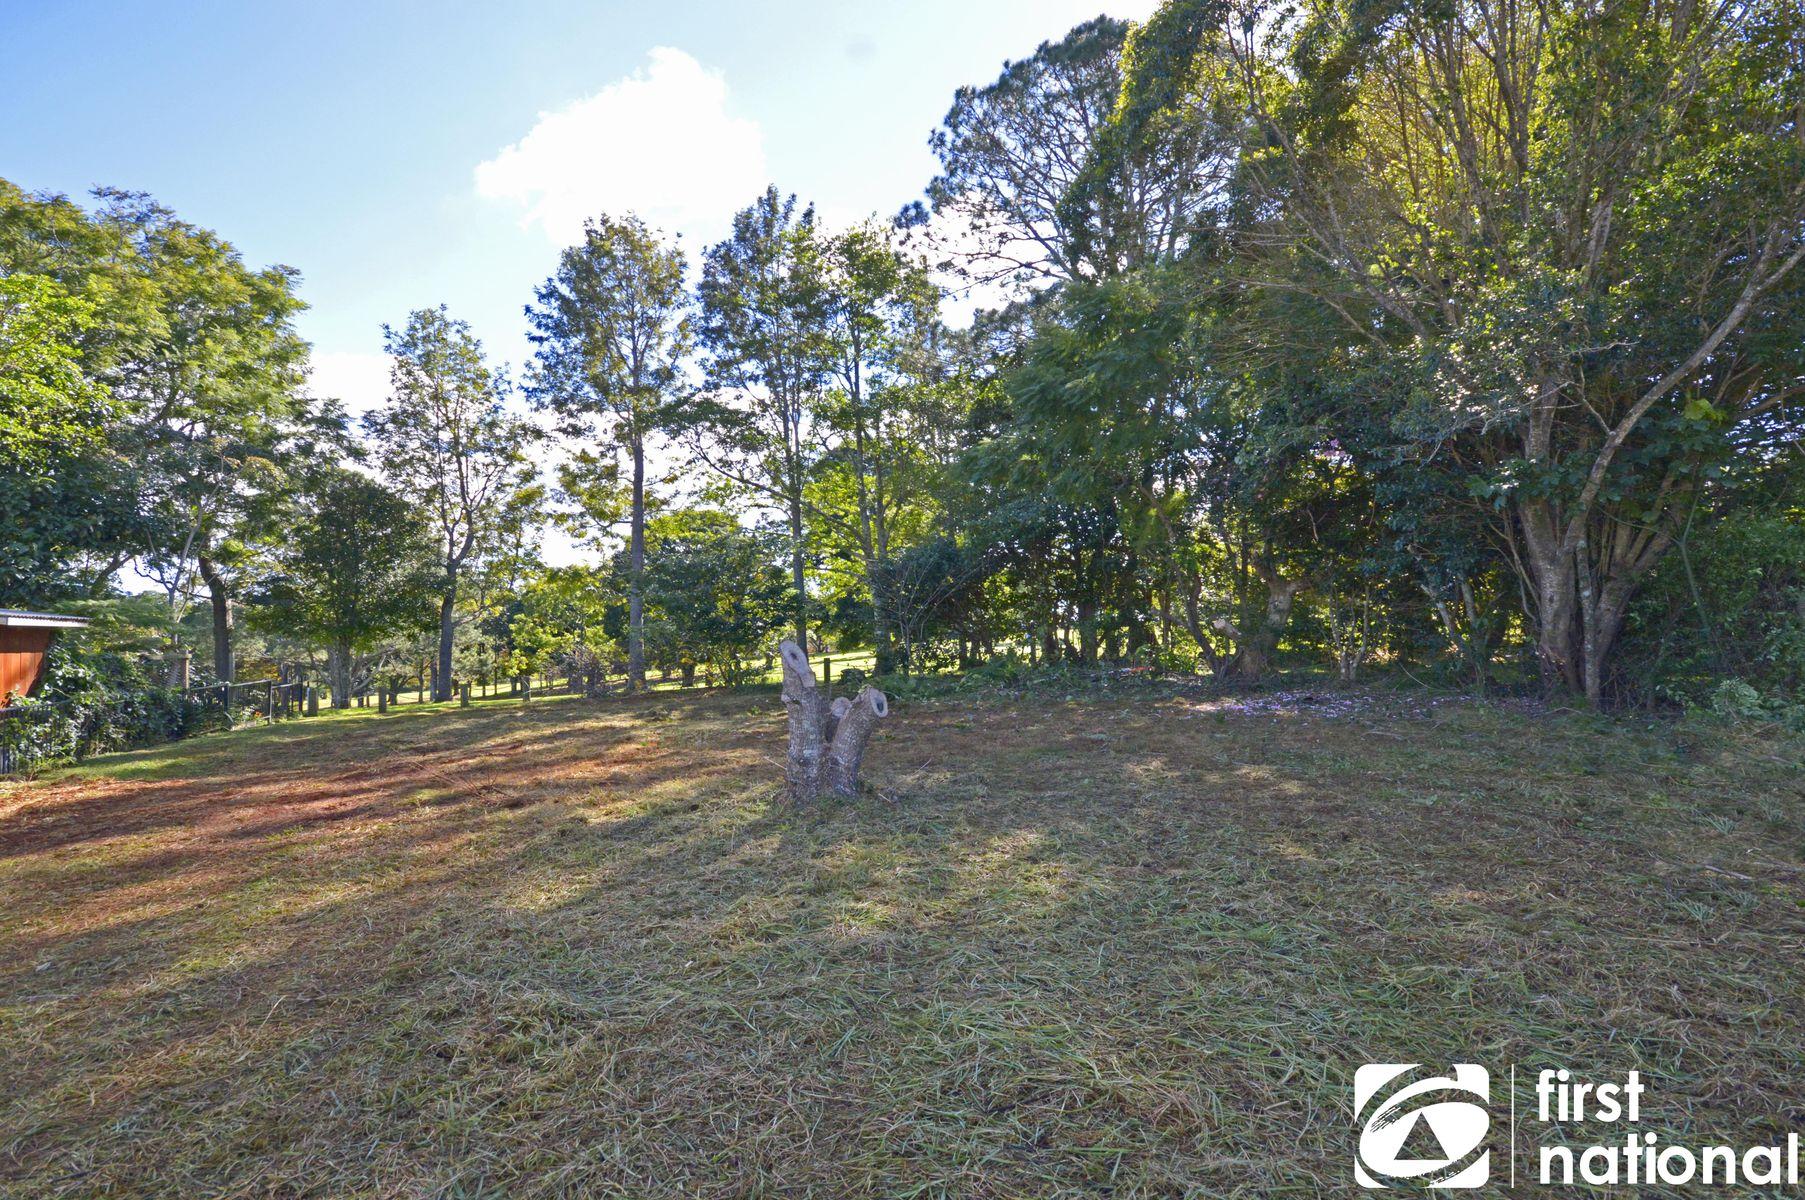 29 Jenyns Road, Tamborine Mountain, QLD 4272